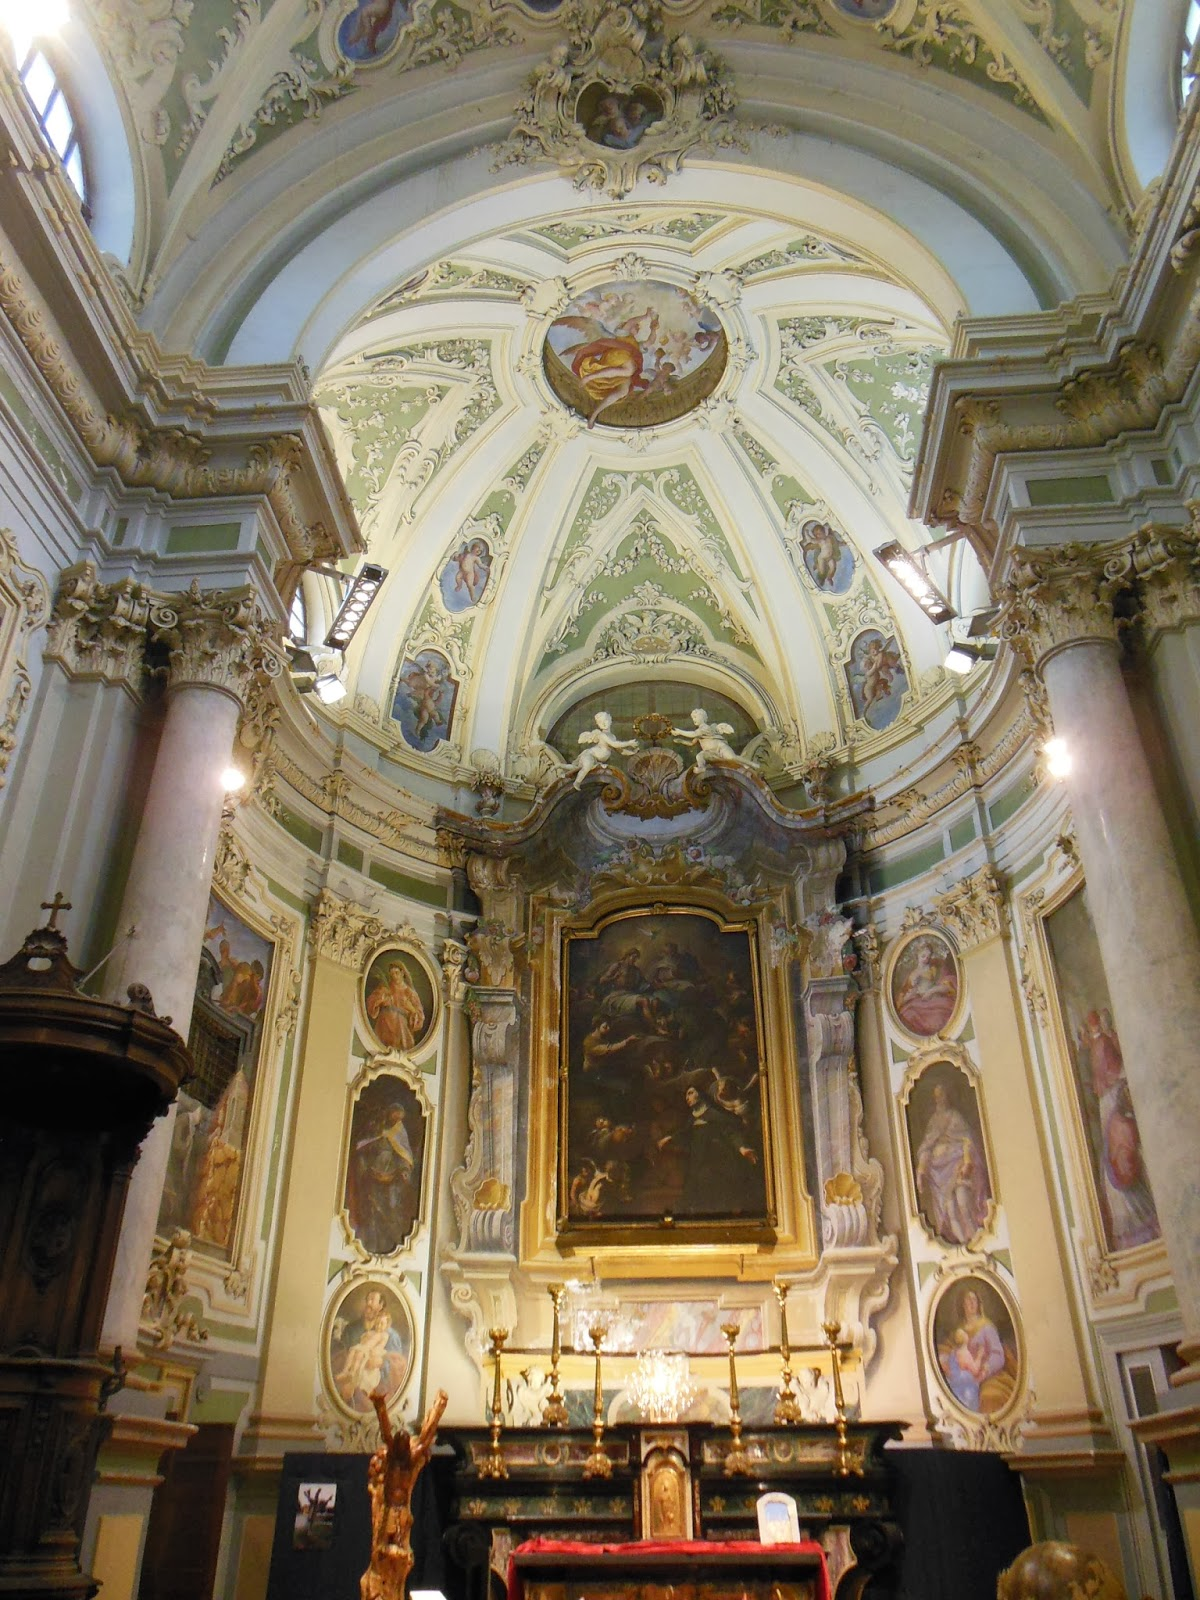 Cuneo e dintorni Exchiesa di Santa Chiara